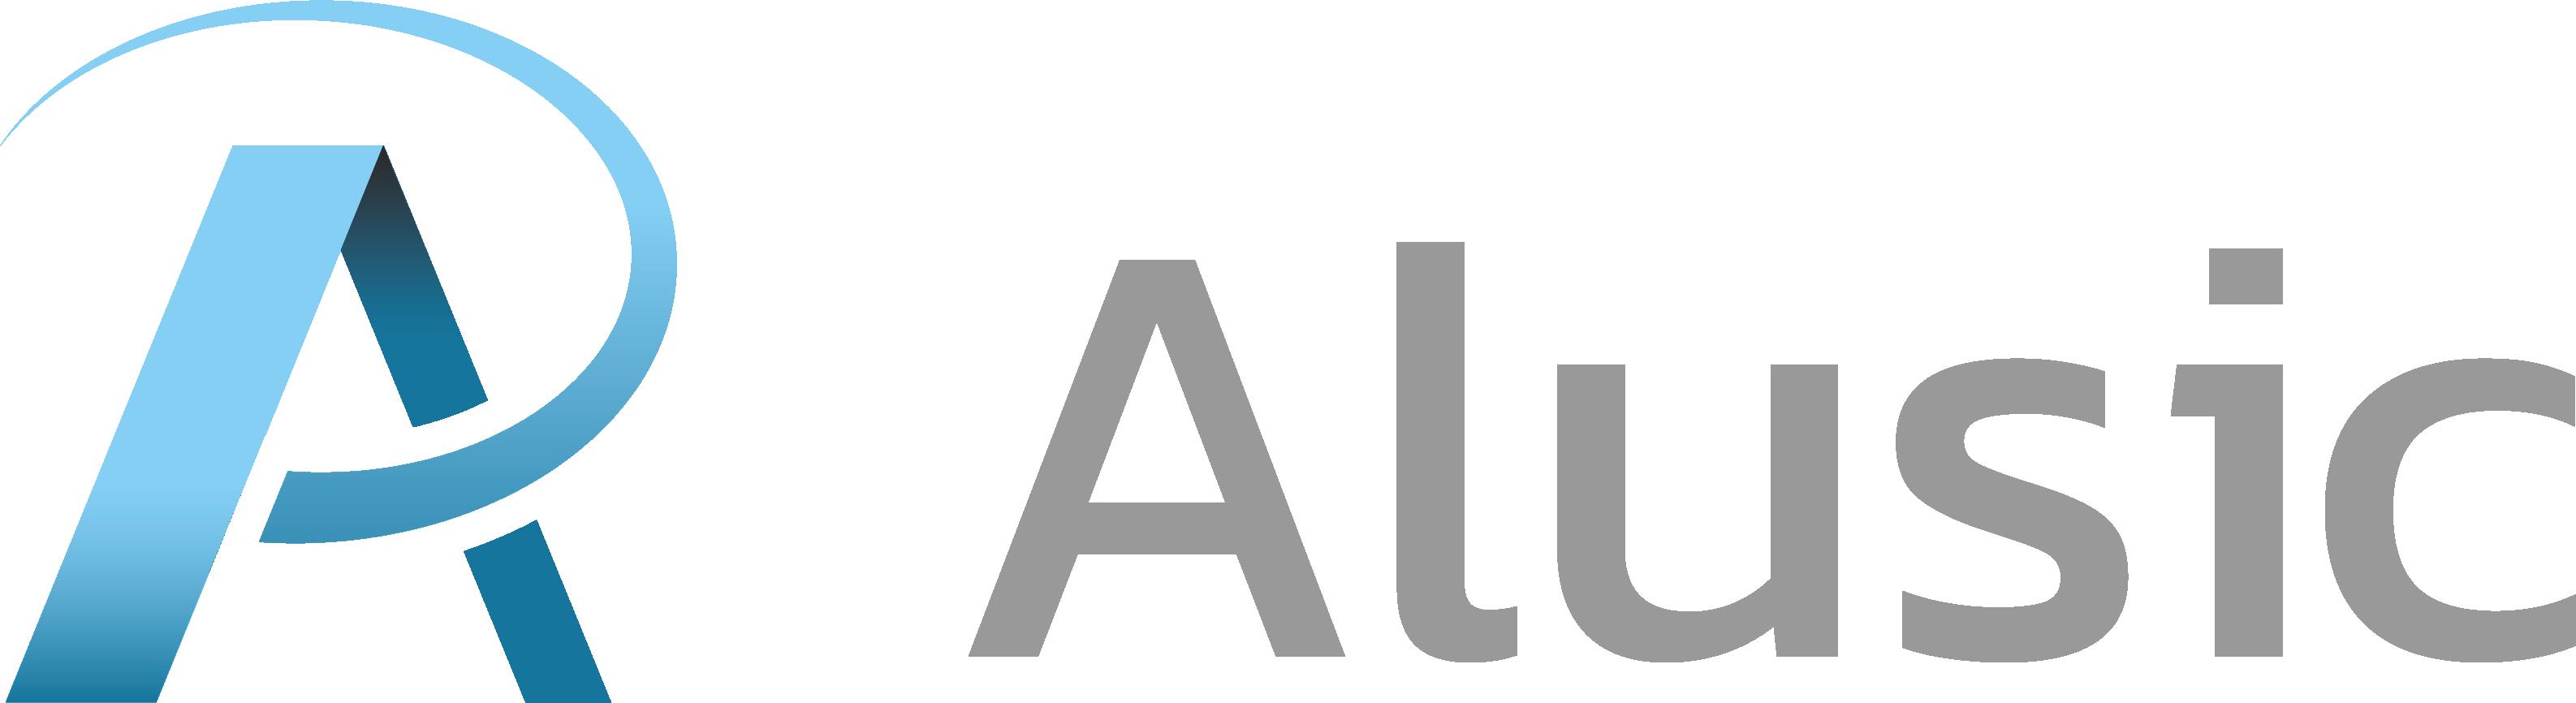 ALUSIC-Logo inline